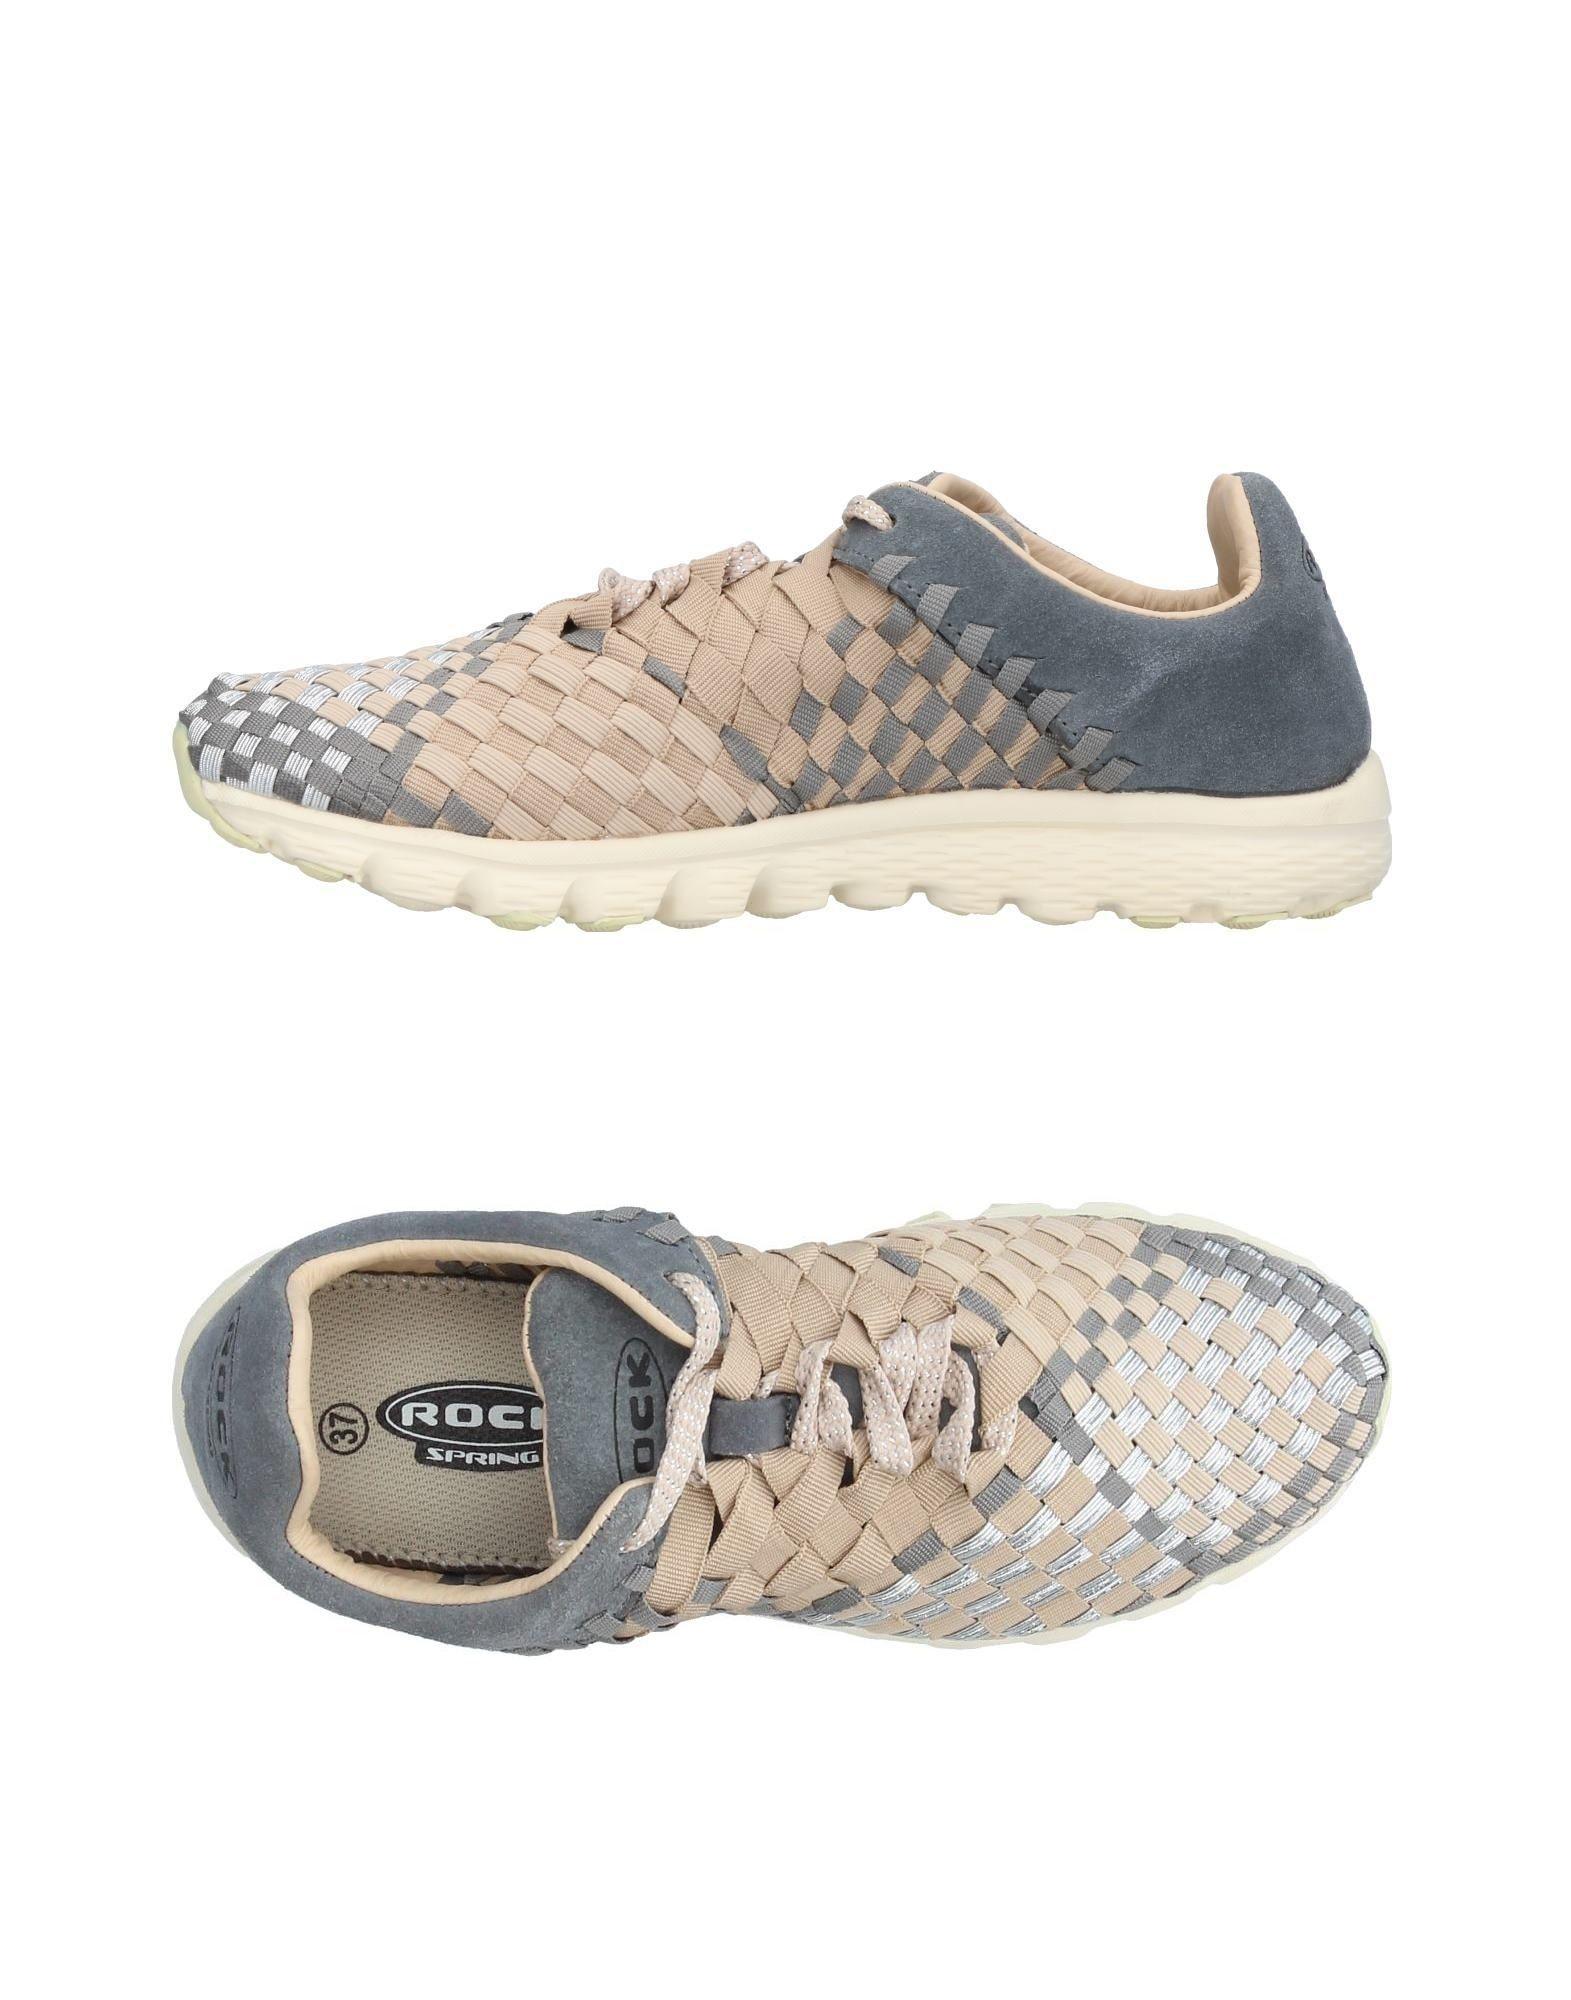 Rock Spring Sneakers Damen  11397624EB Gute Qualität beliebte Schuhe